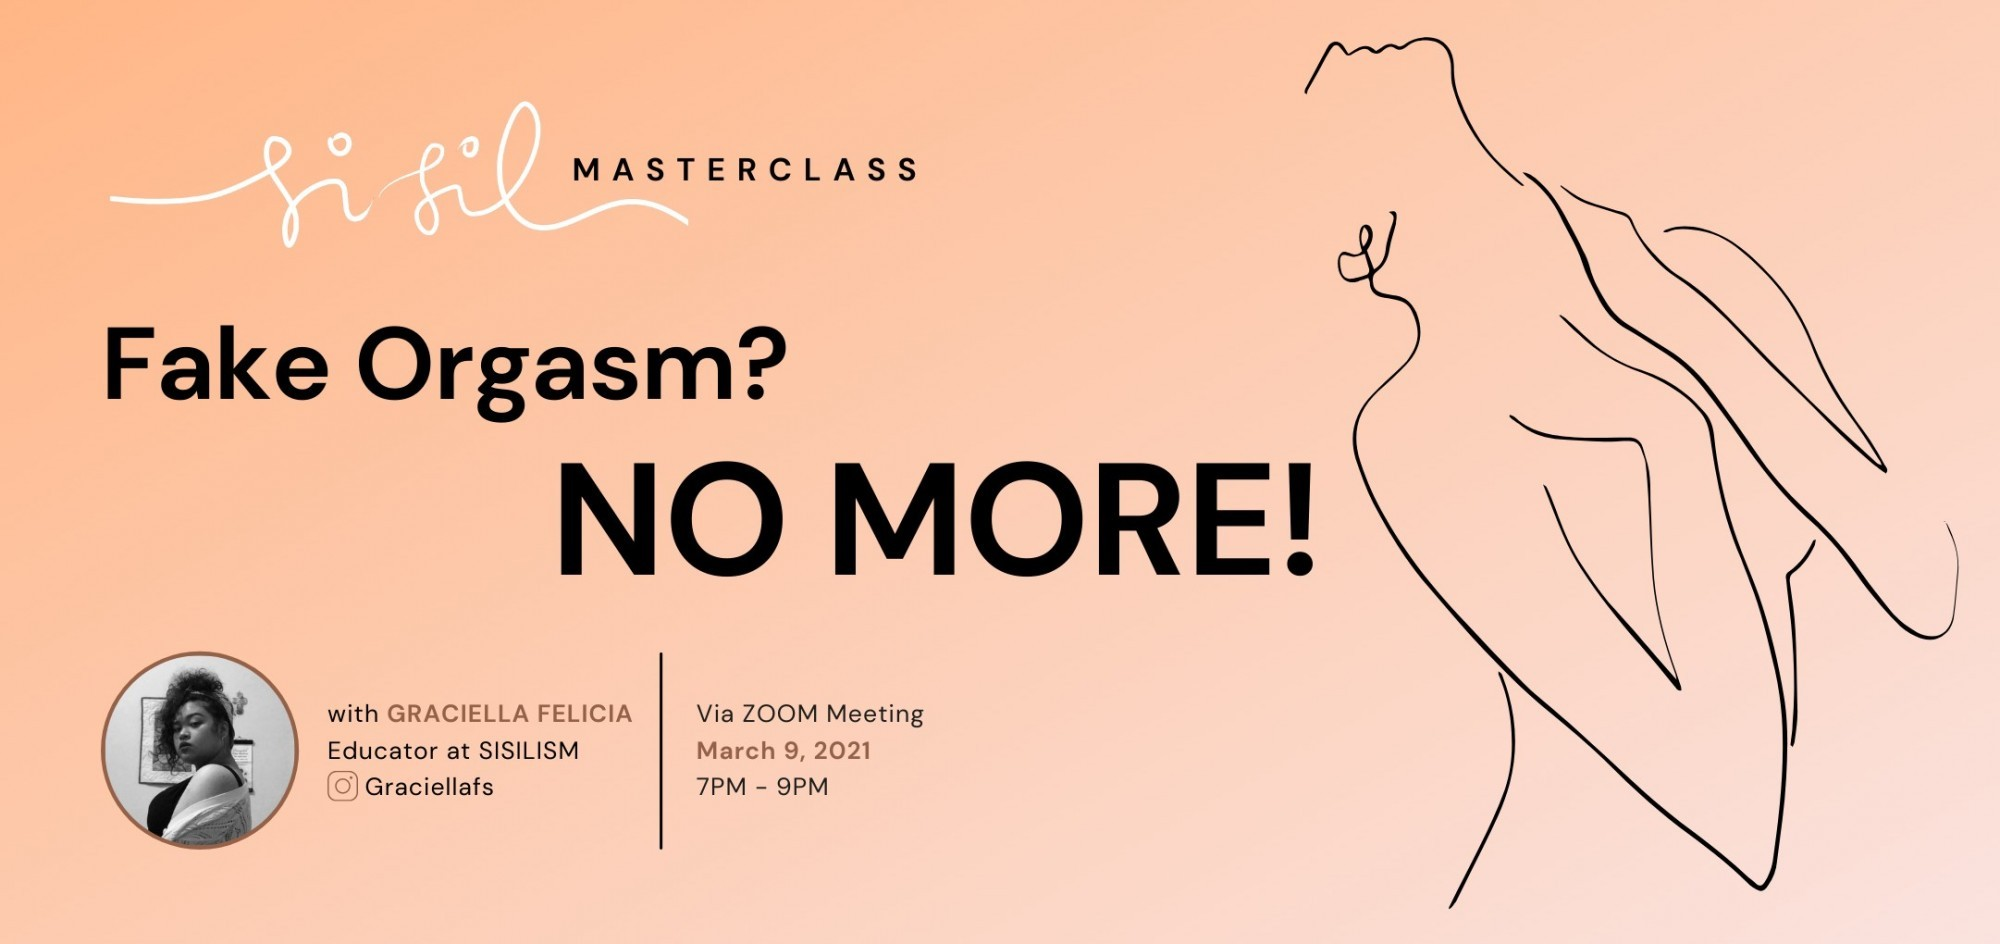 Fake Orgasm? NO MORE! - Sisilism Masterclass